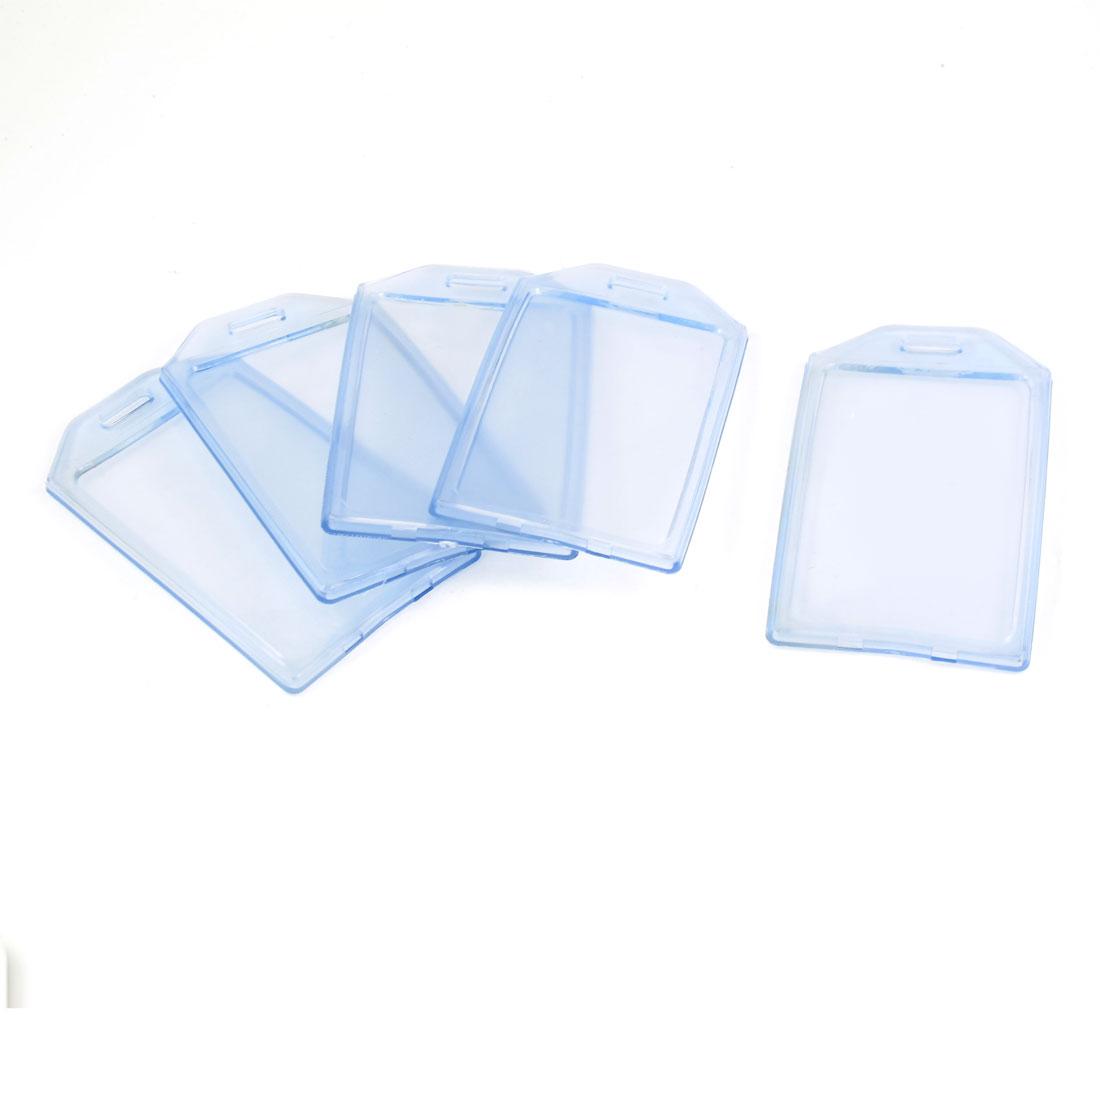 5 Pcs Clear Blue Soft Plastic Vertical ID Card Badge Holders